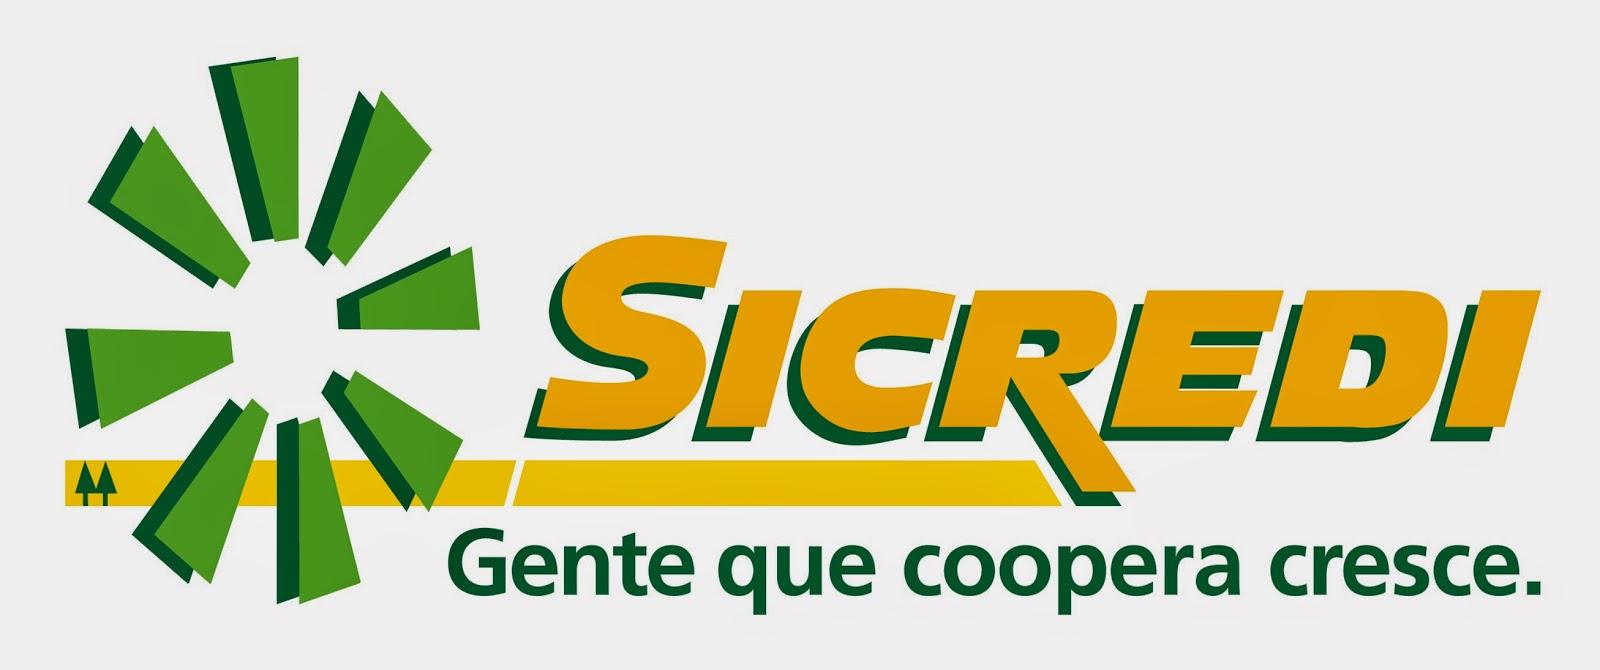 Bansicredi Logo photo - 1